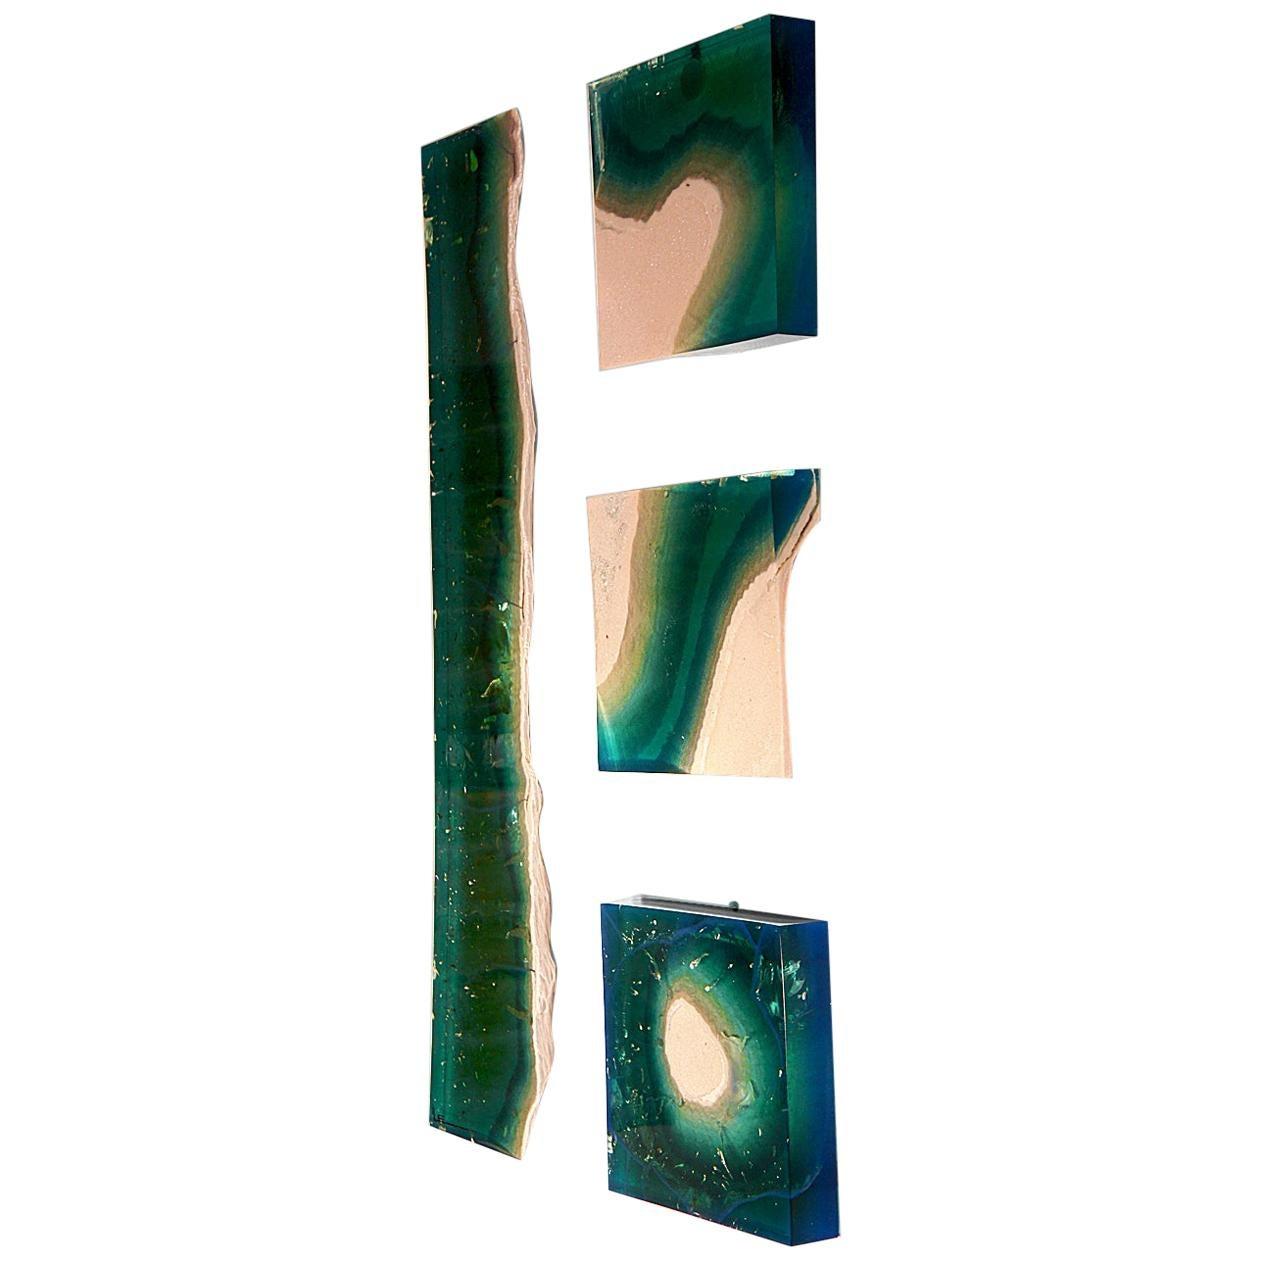 Aqua Blocks Contemporary Wall Sculpture by Eduard Locota, Acrylic Glass & Marble